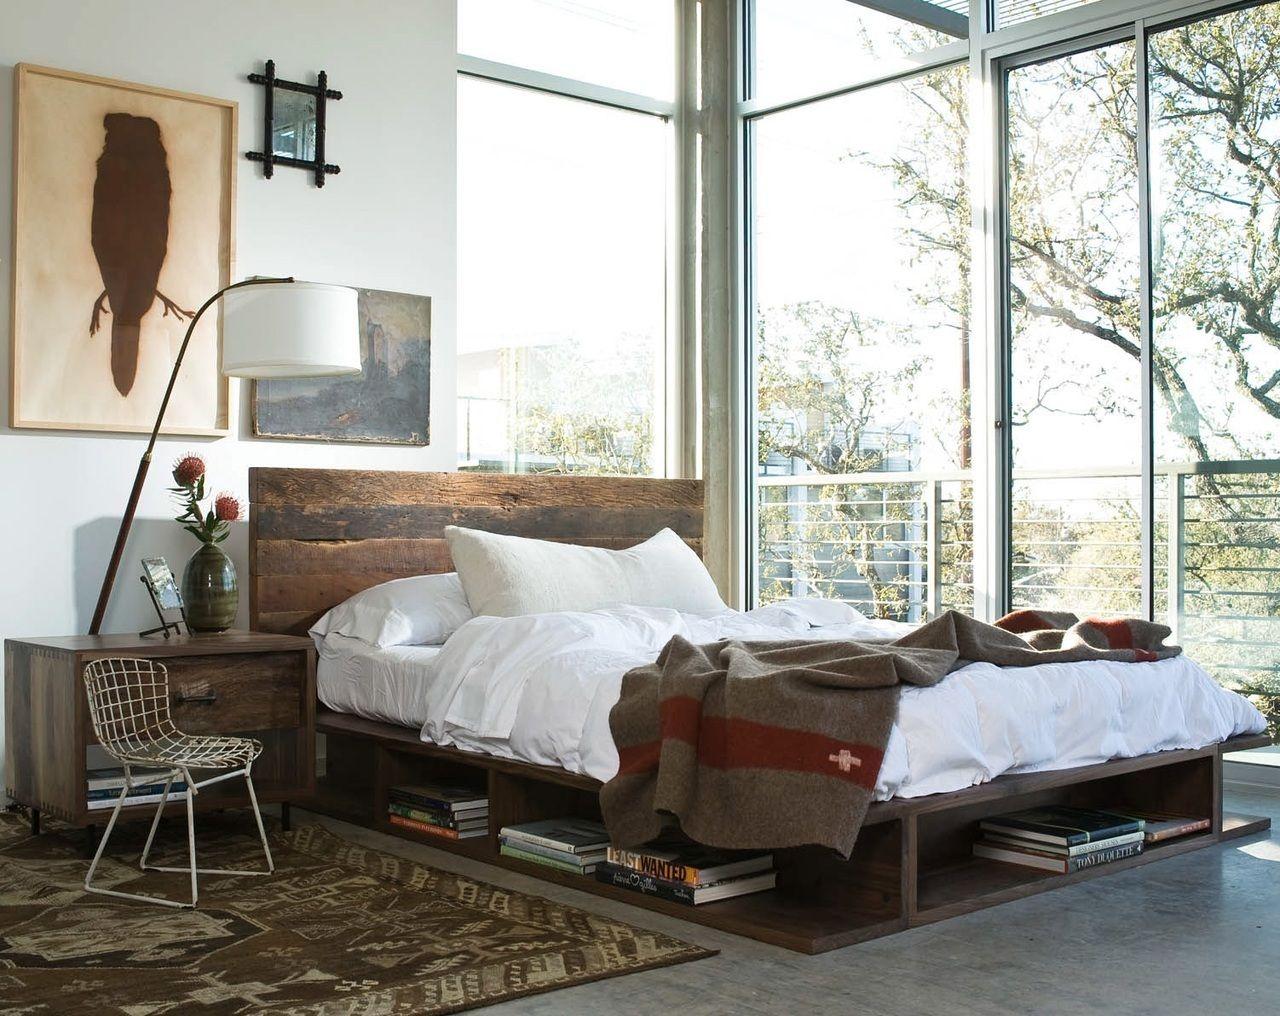 79e27e29b155 Bonnie King Platform Bed | Reclaimed Wood Rustic Bed Frame | Zin Home